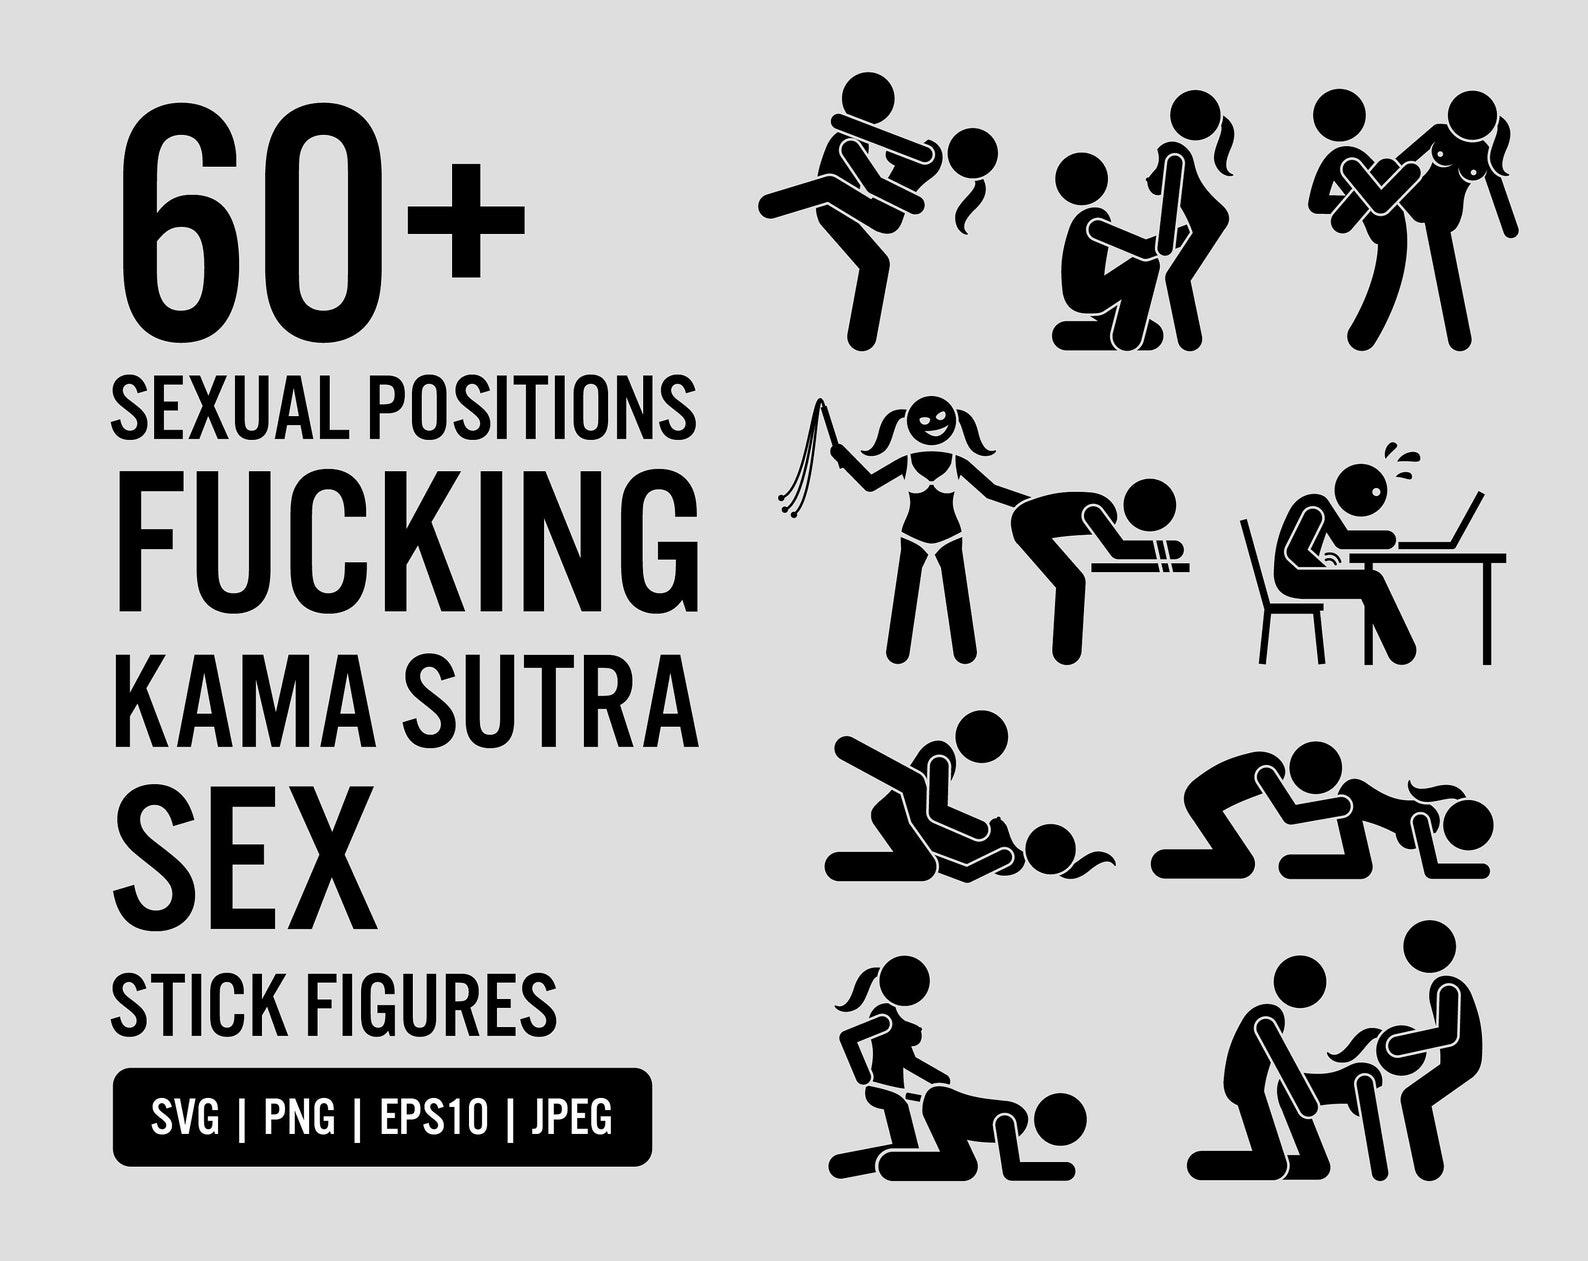 Kamasutra fucking positions hot gallery